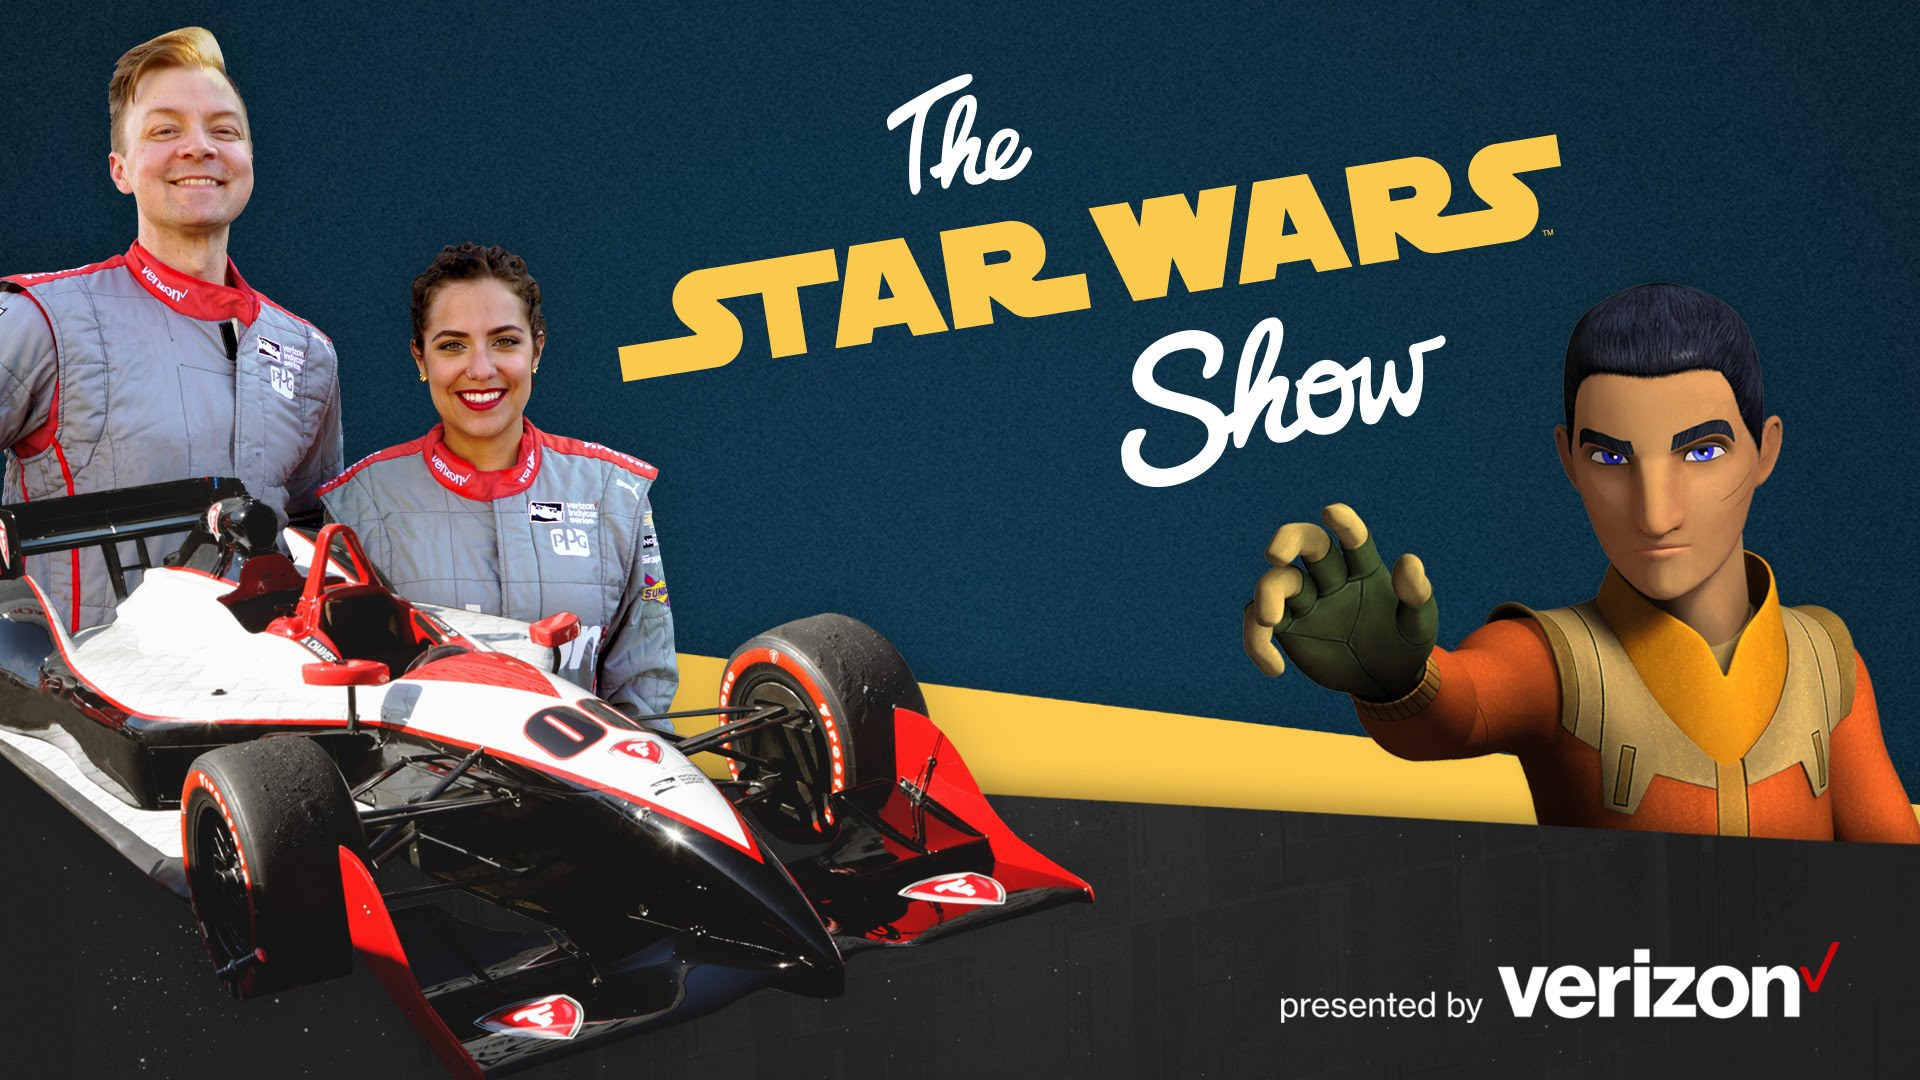 Star Wars Rebels Season 3 Clip, Marvel Editor Jordan D. White Interview, and More | StarWars.com